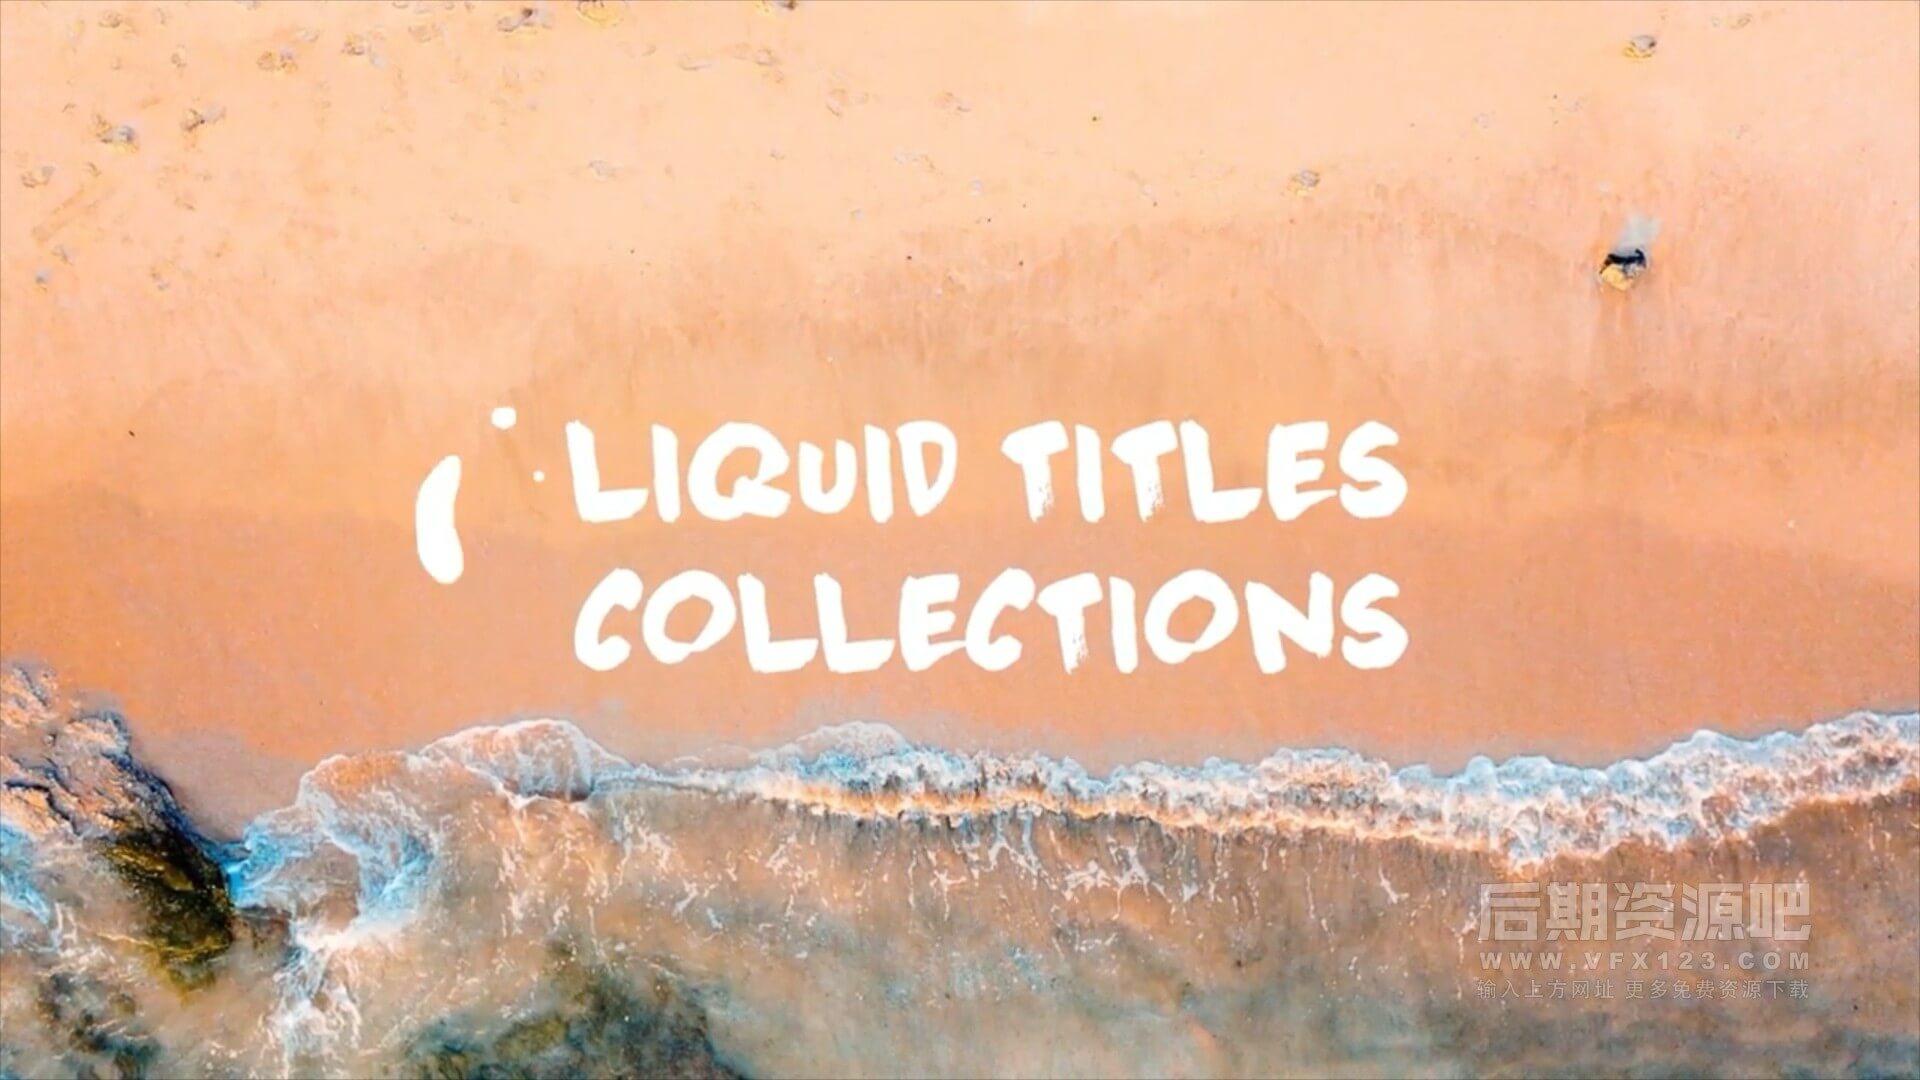 fcpx插件 10组卡通可爱水主题标题动画模板 Liquid Titles Collection